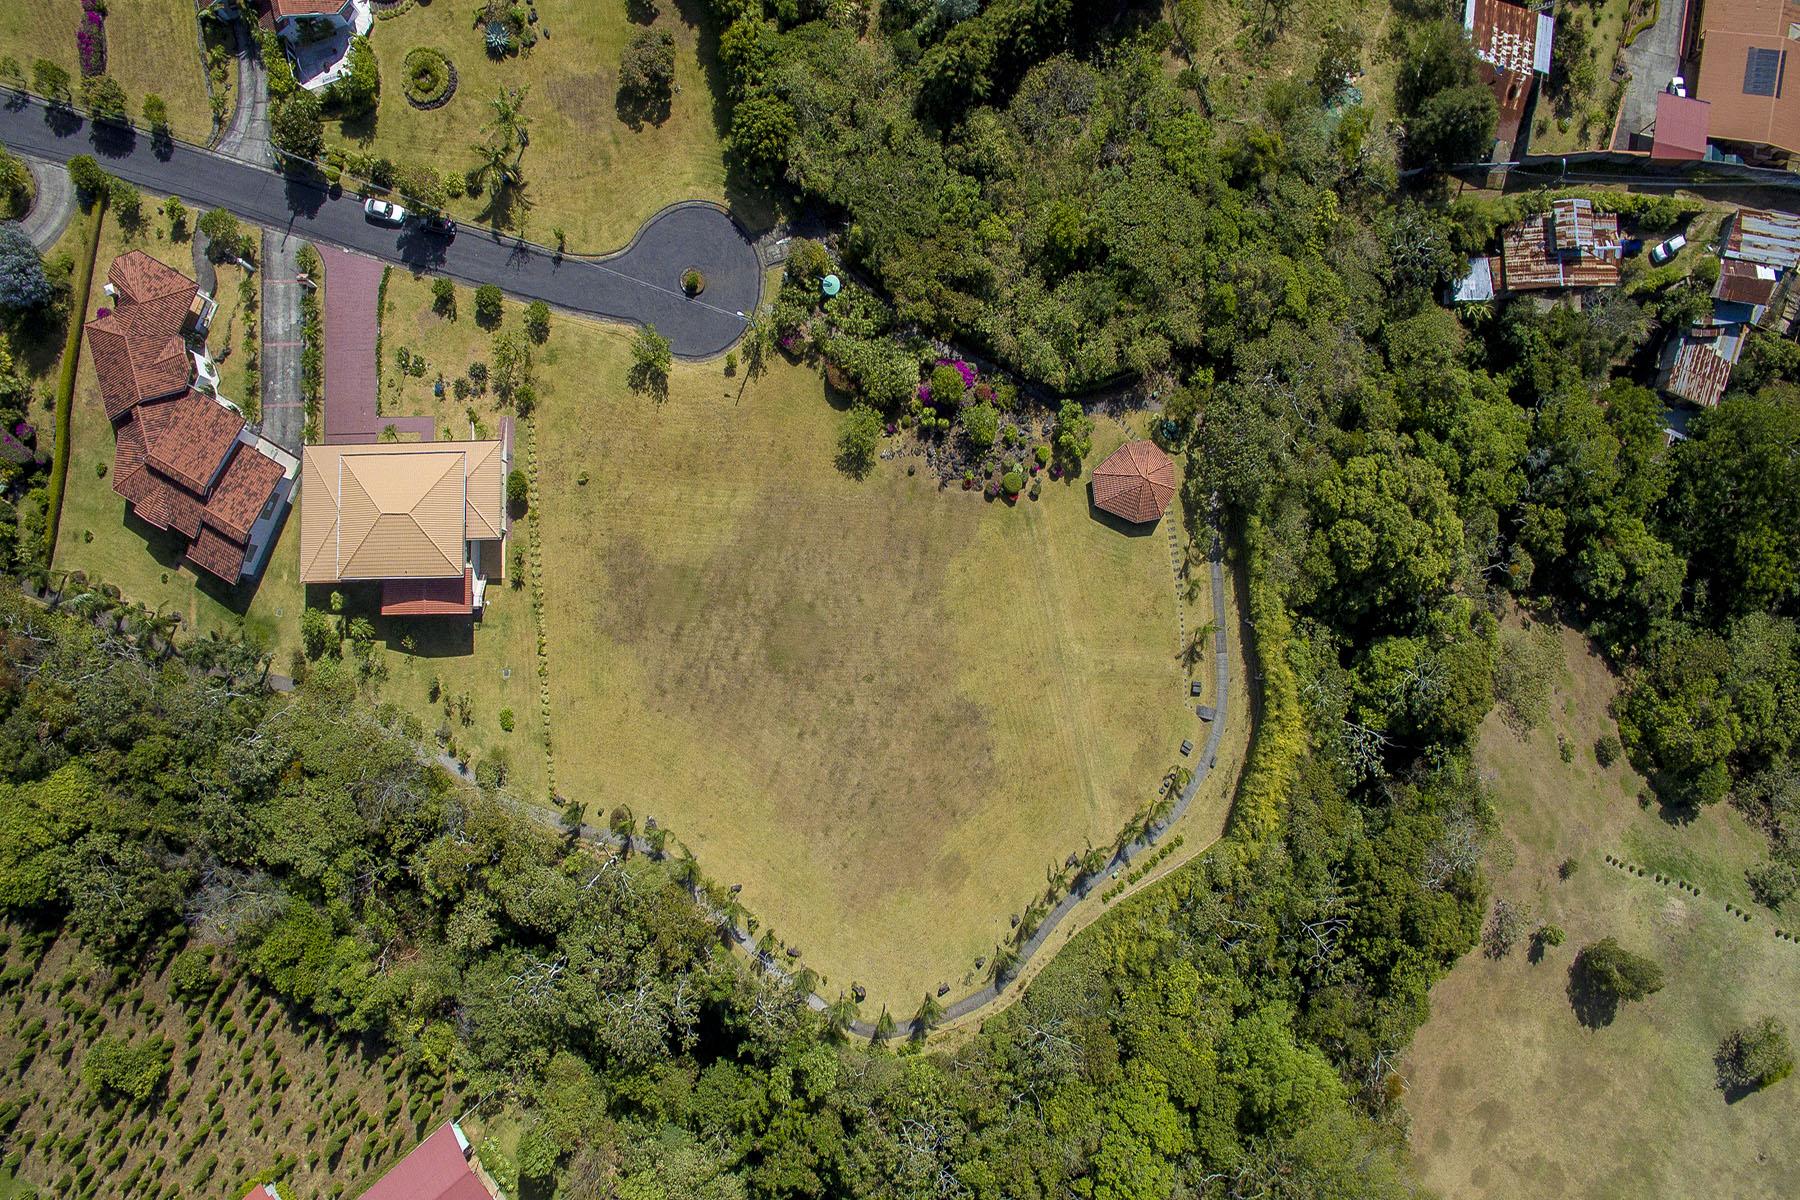 Additional photo for property listing at LOTE CONDOMINIO SAN RAFAEL II San Rafael, Heredia Costa Rica